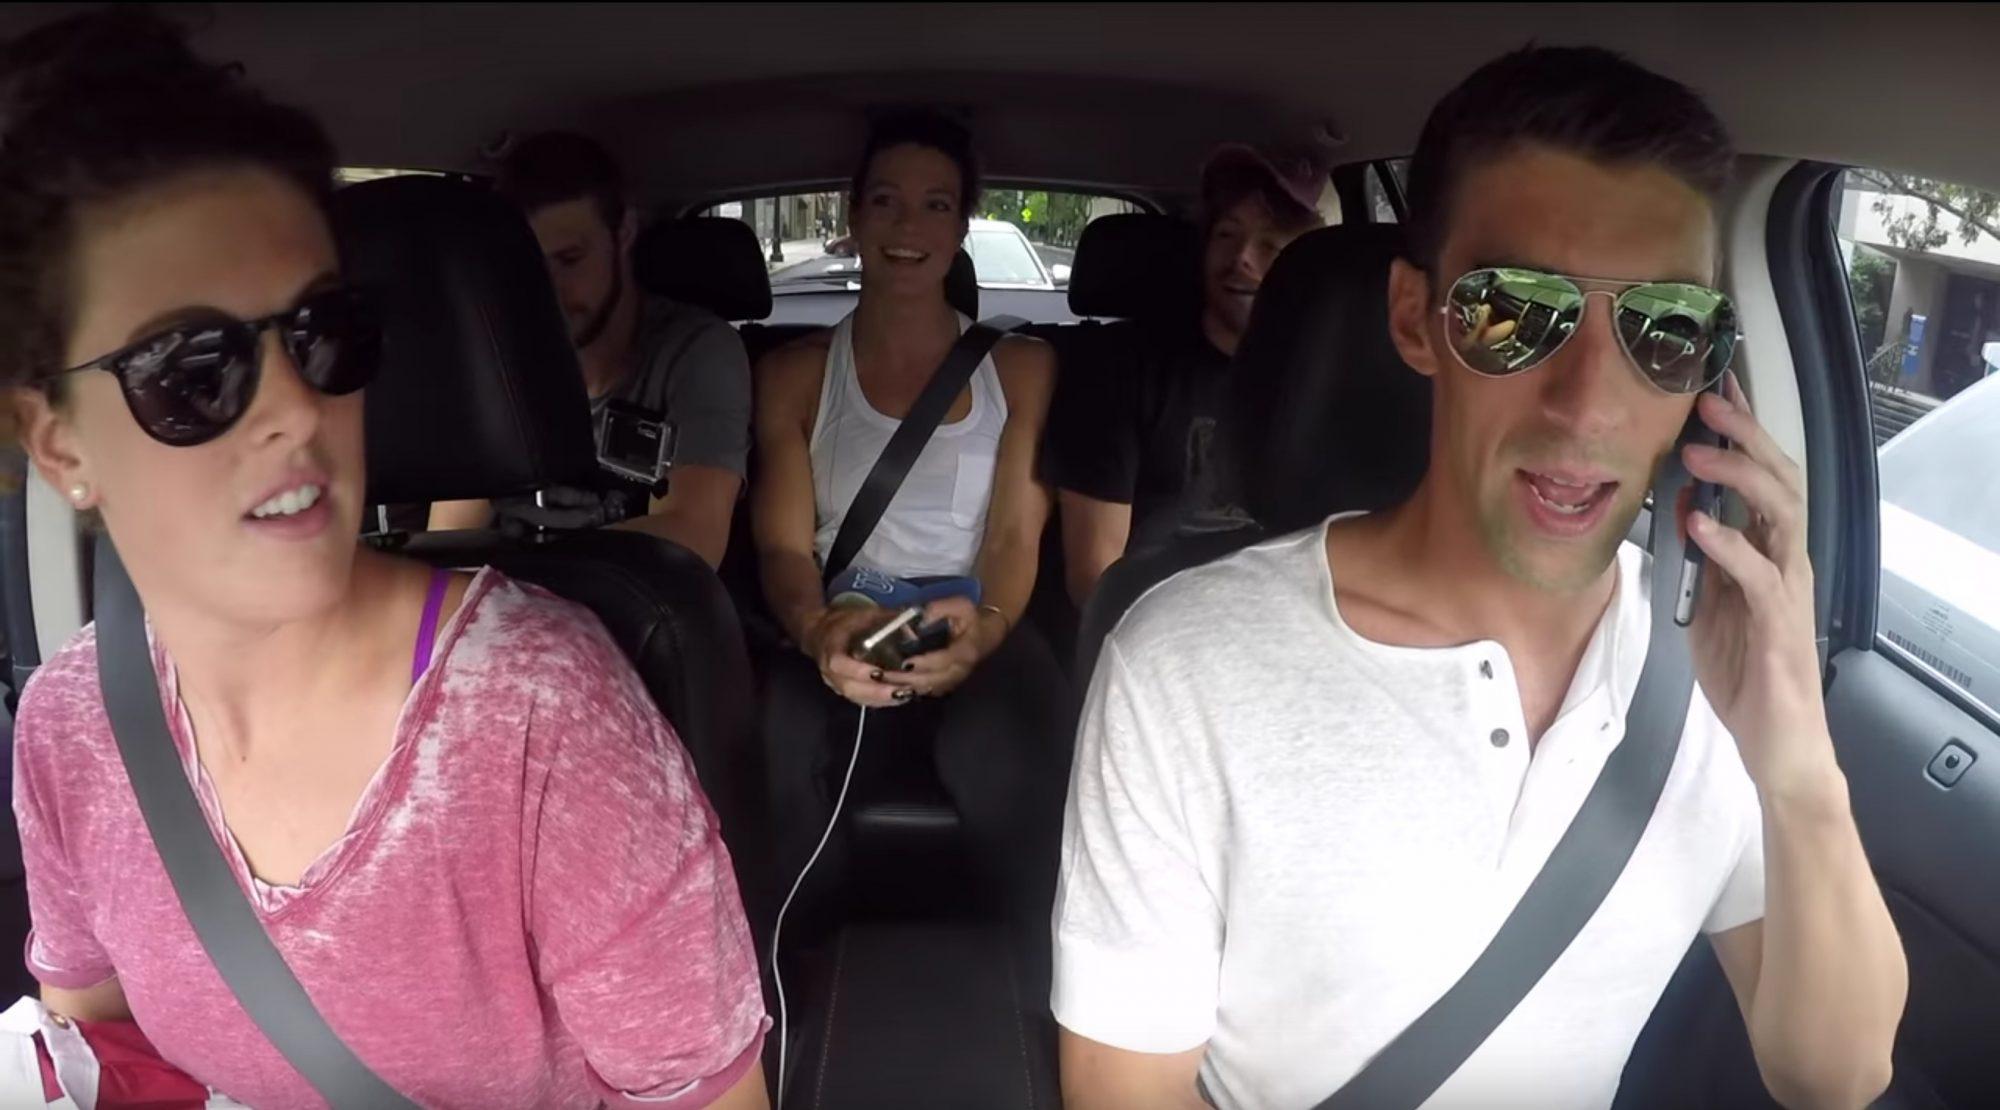 Michael-Phelps-Carpool-Karaoke